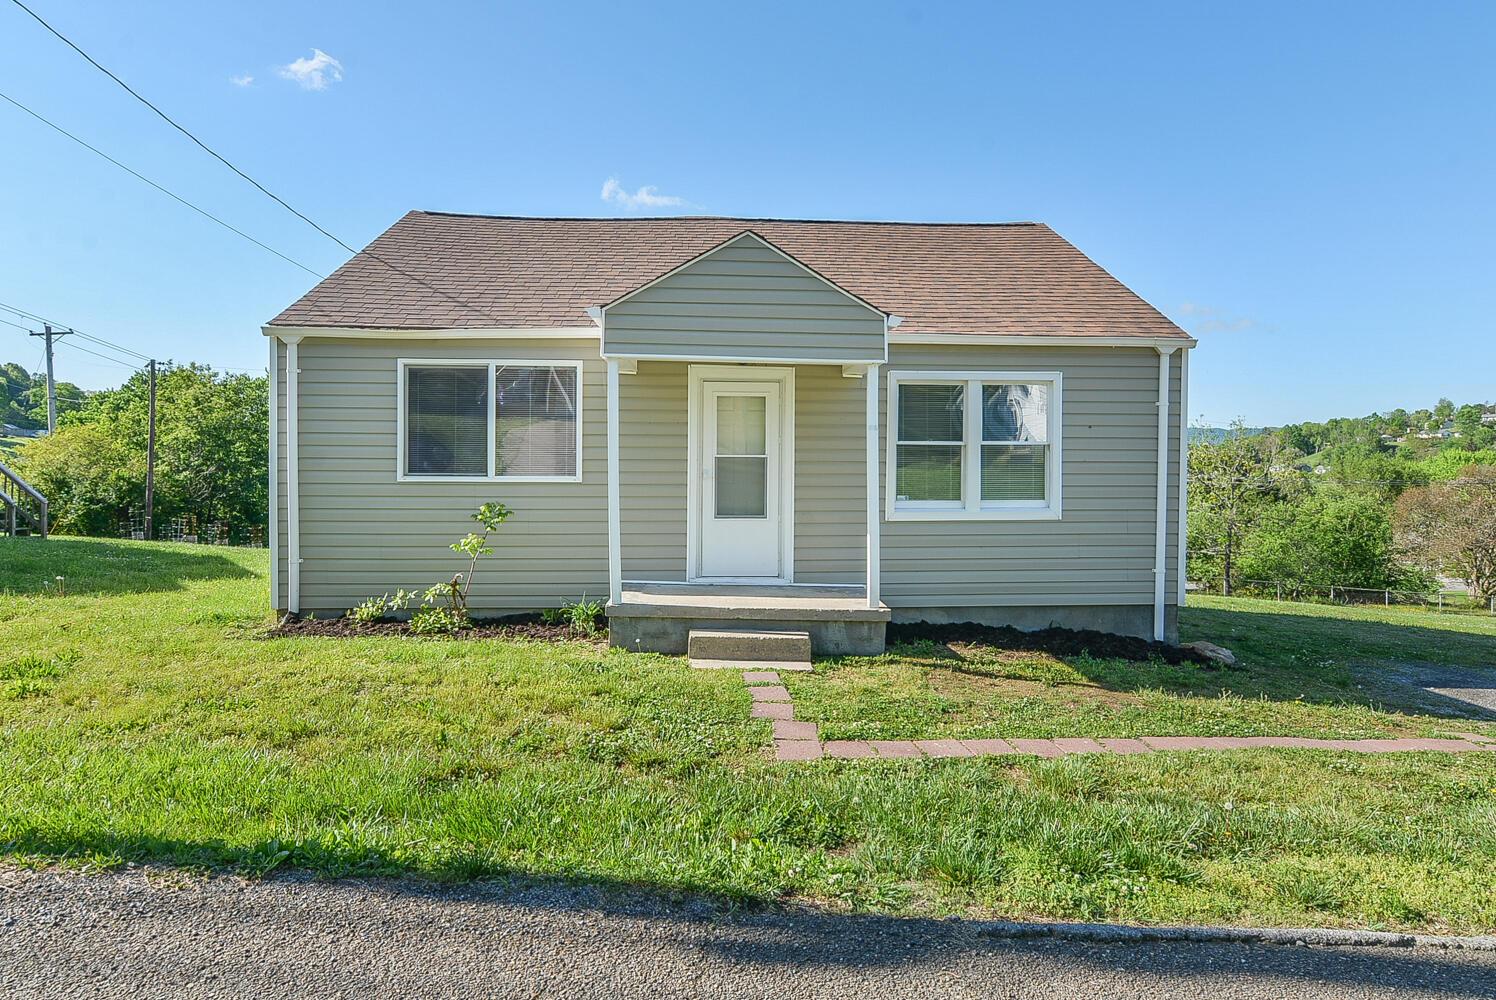 168 Mullins Street, Kingsport, Tennessee 37665, 2 Bedrooms Bedrooms, ,1 BathroomBathrooms,Single Family,For Sale,168 Mullins Street,1,9922182